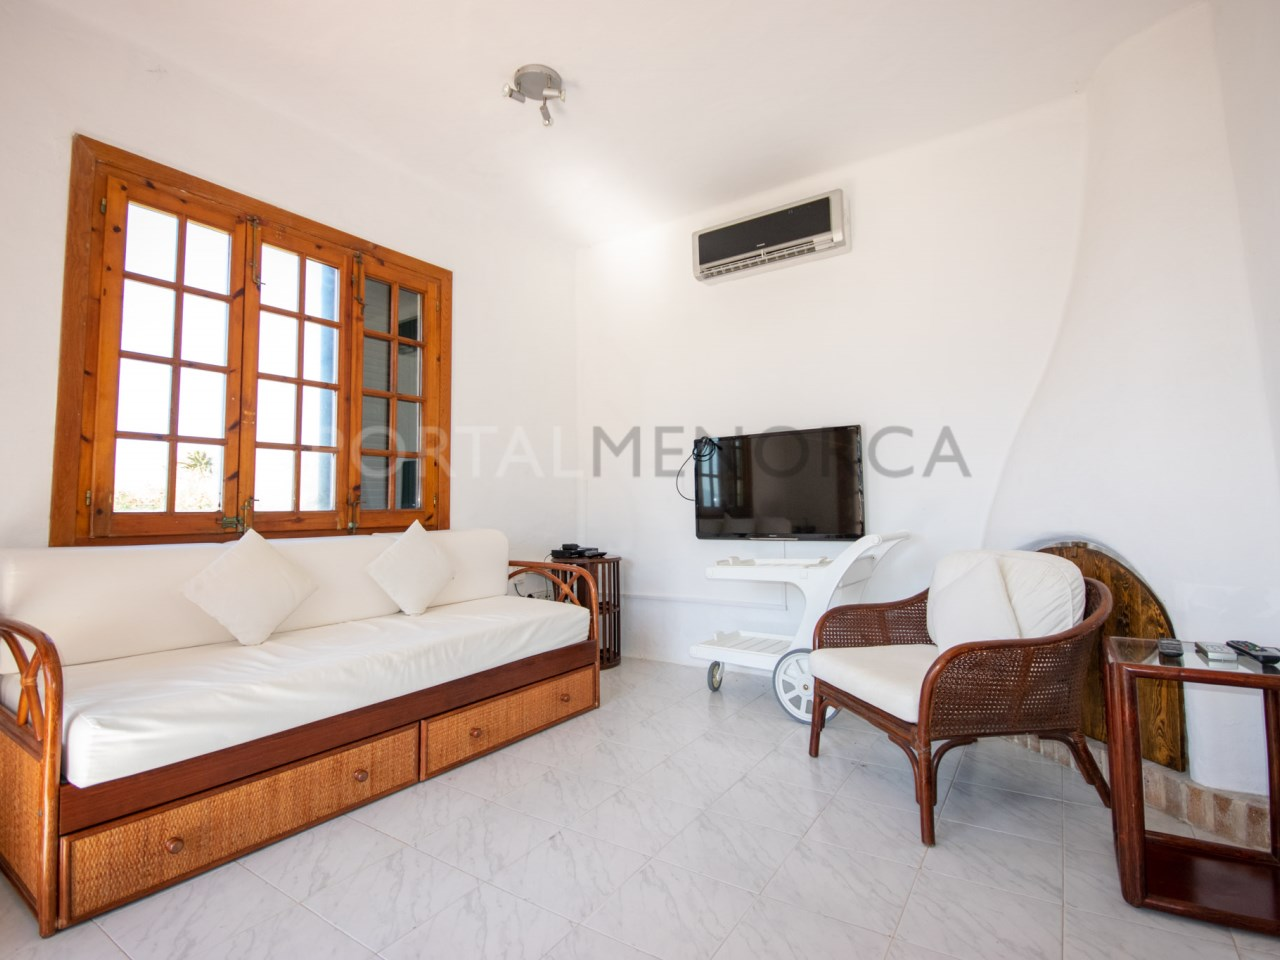 living room from a villa in playas de fornells